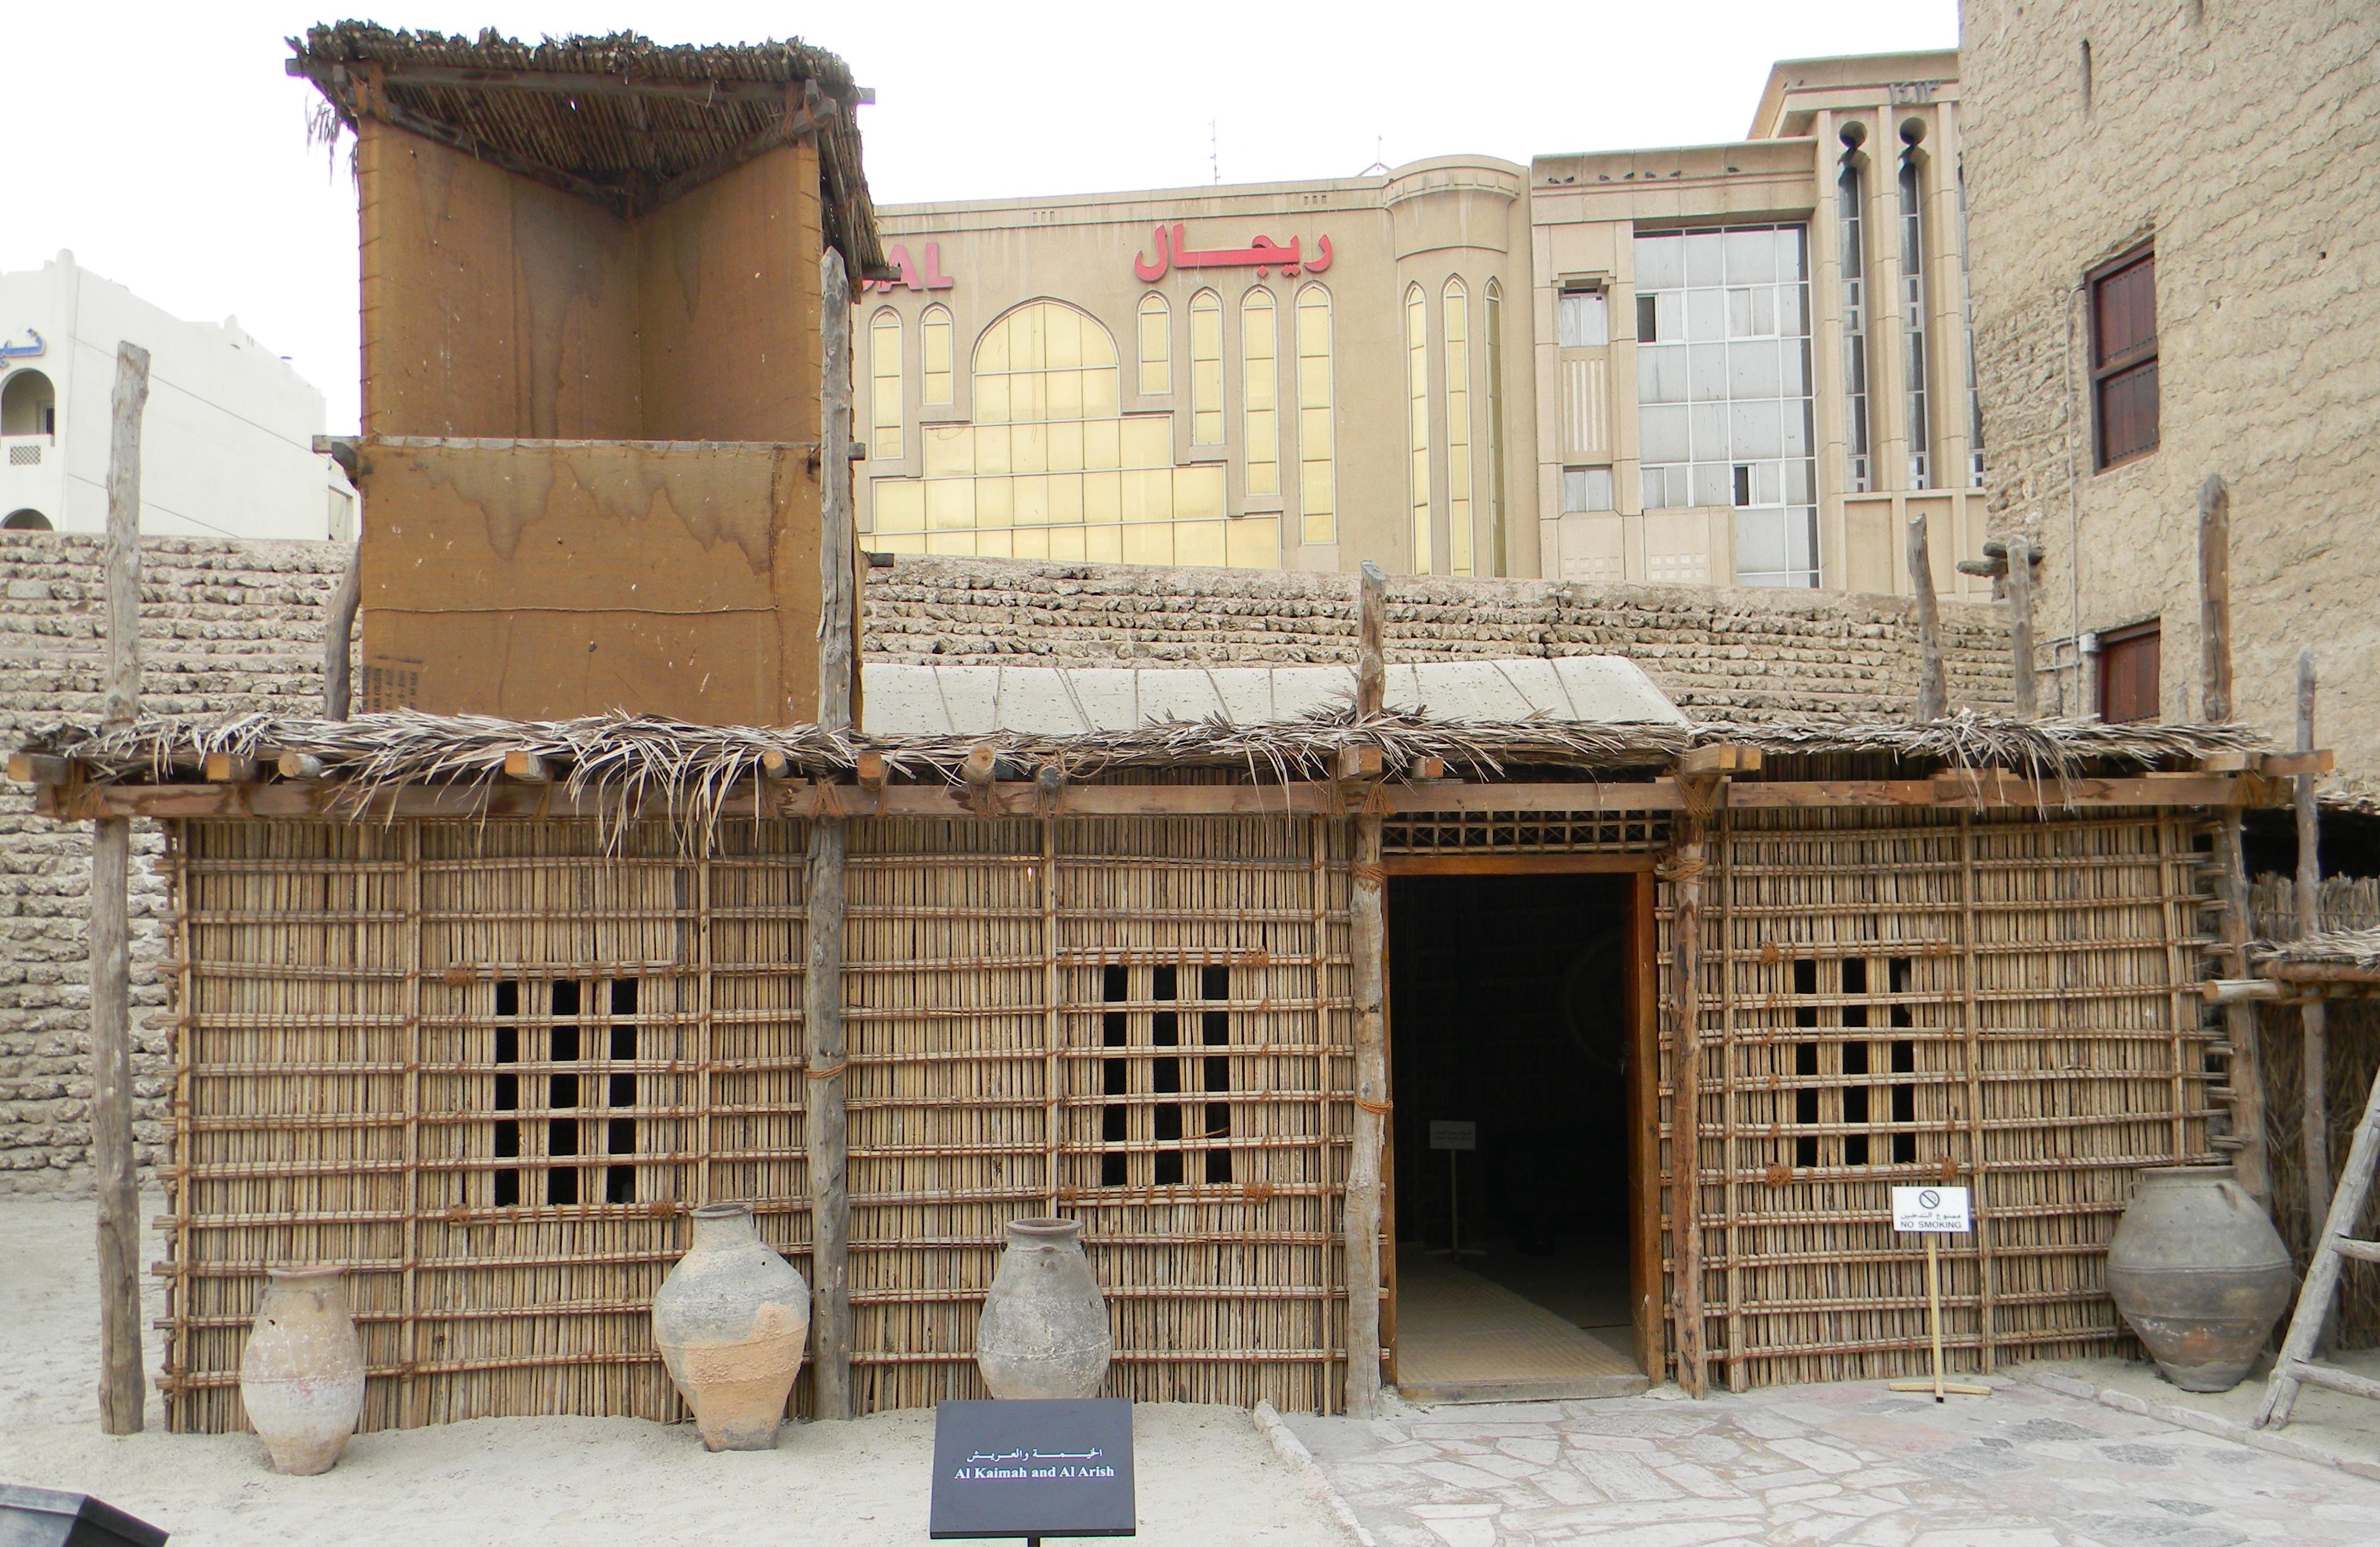 File:Al kaimah vernacular architecture of UAE.jpg ...